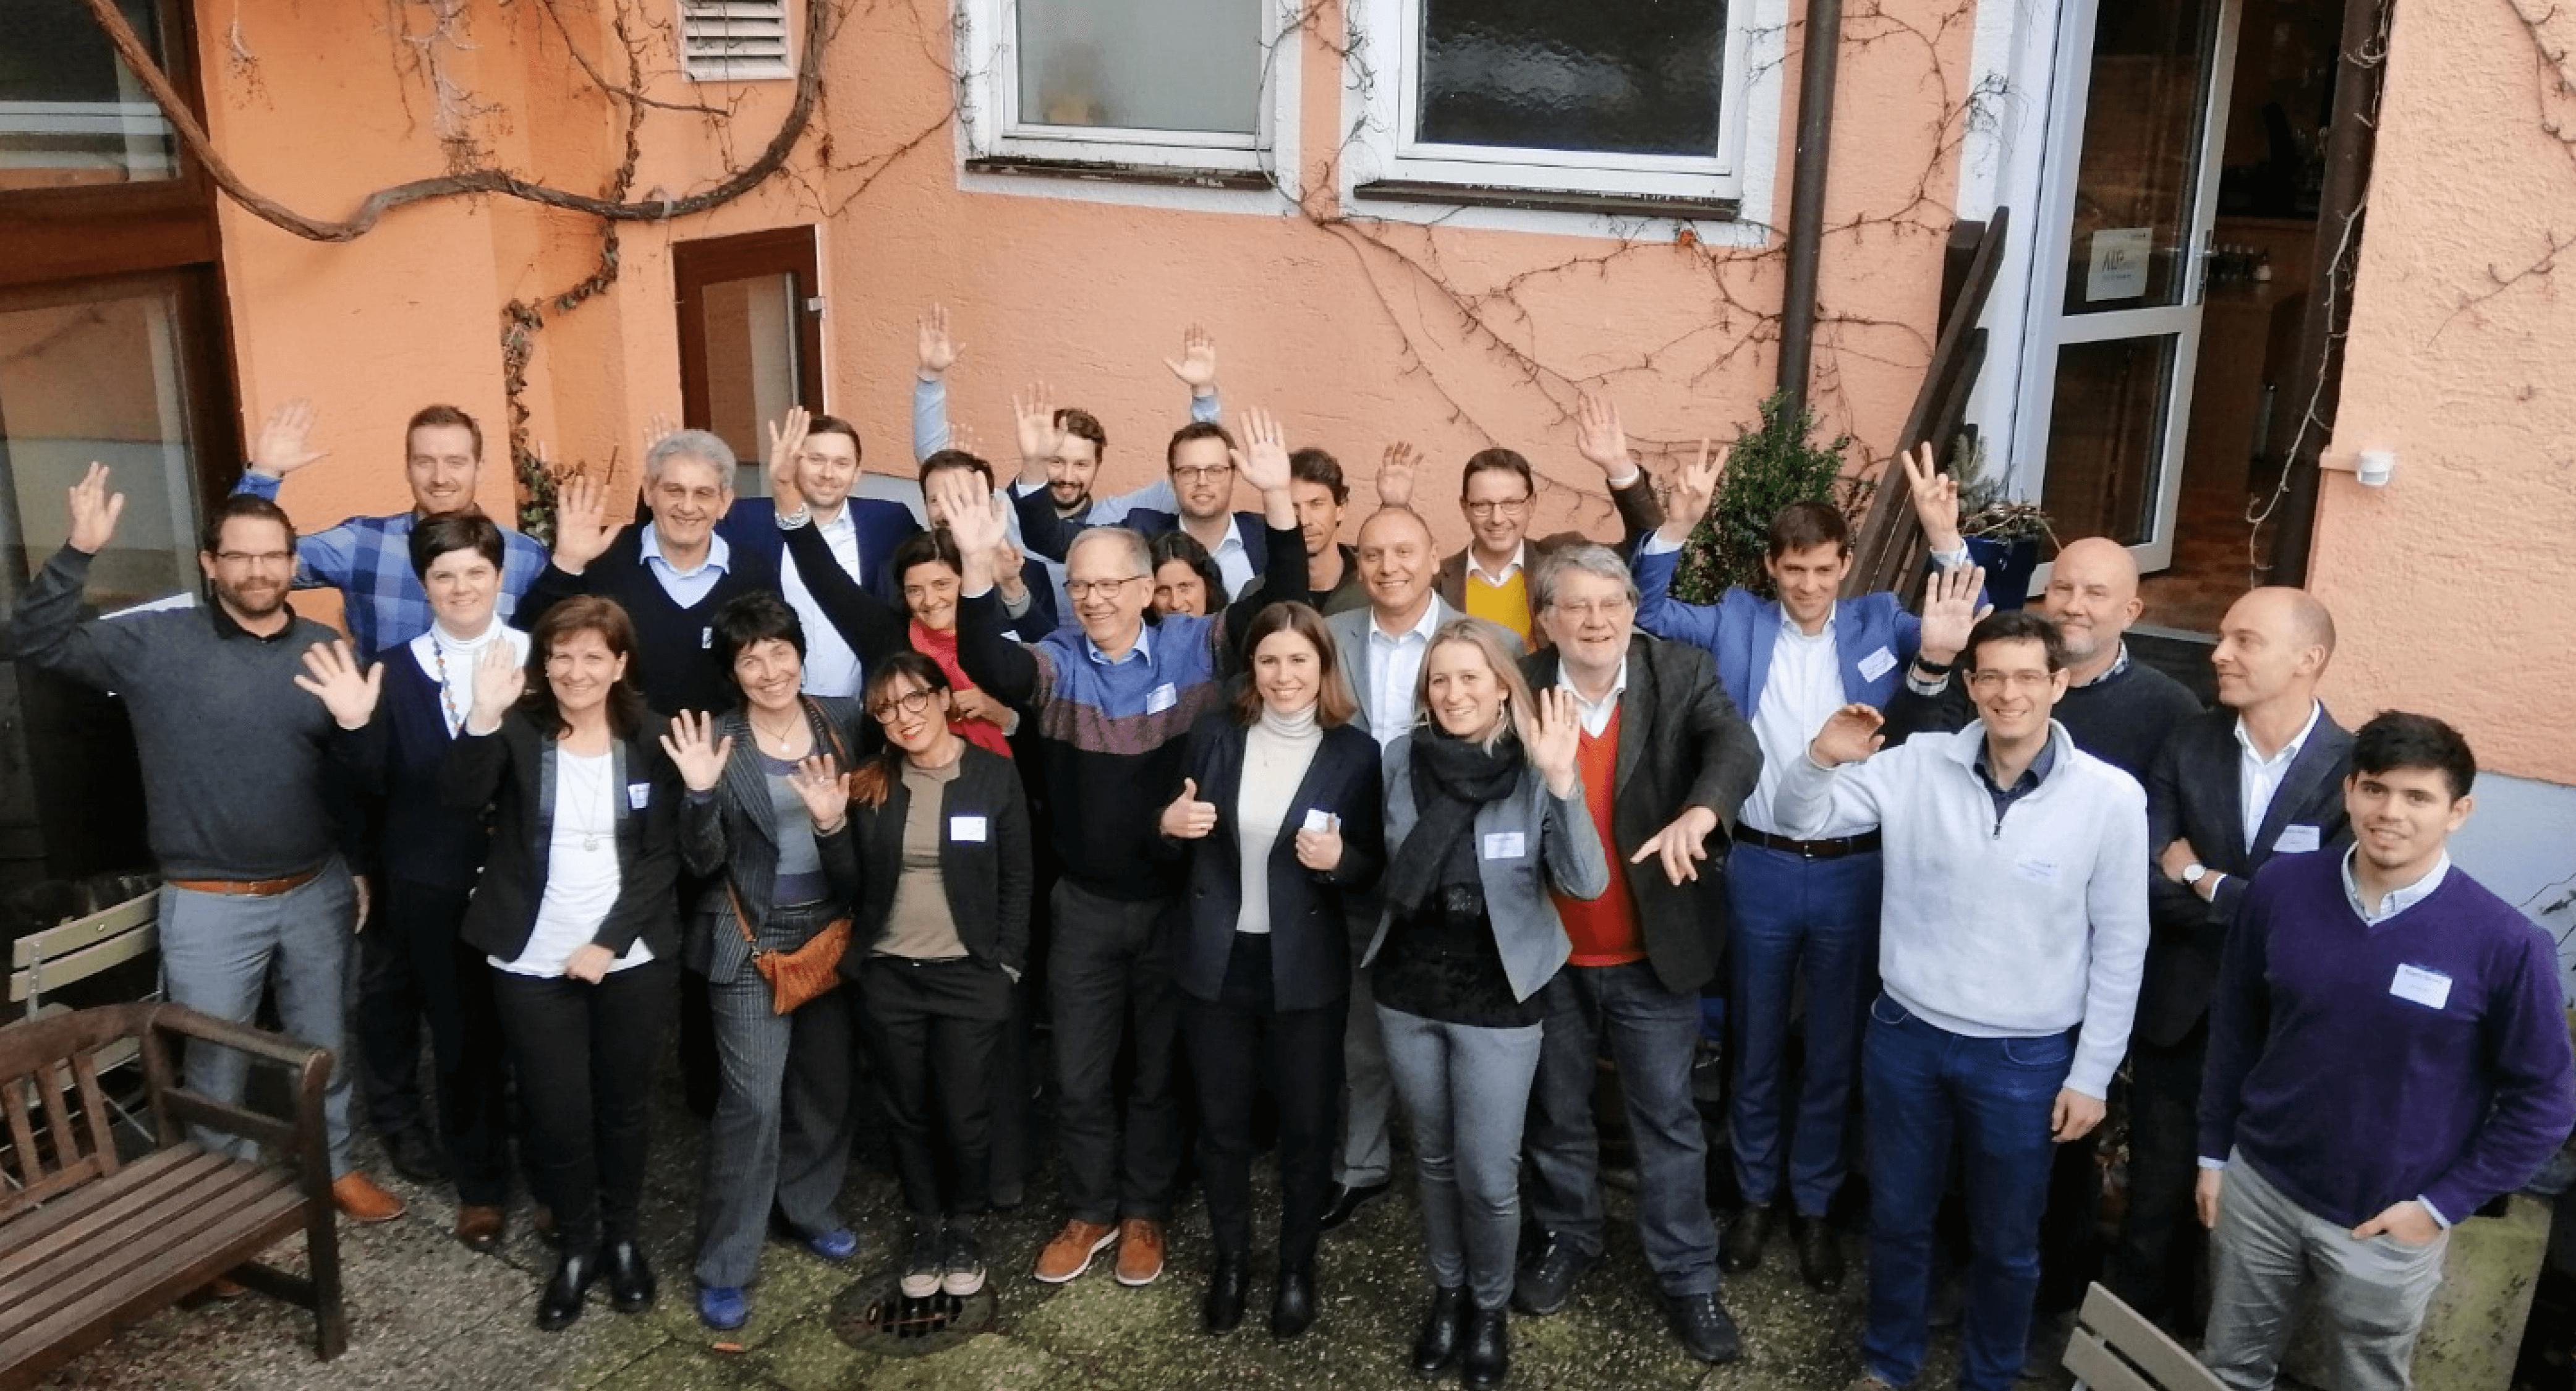 Teamfoto Teilnehmer am Alpgrids Programm in Grafing